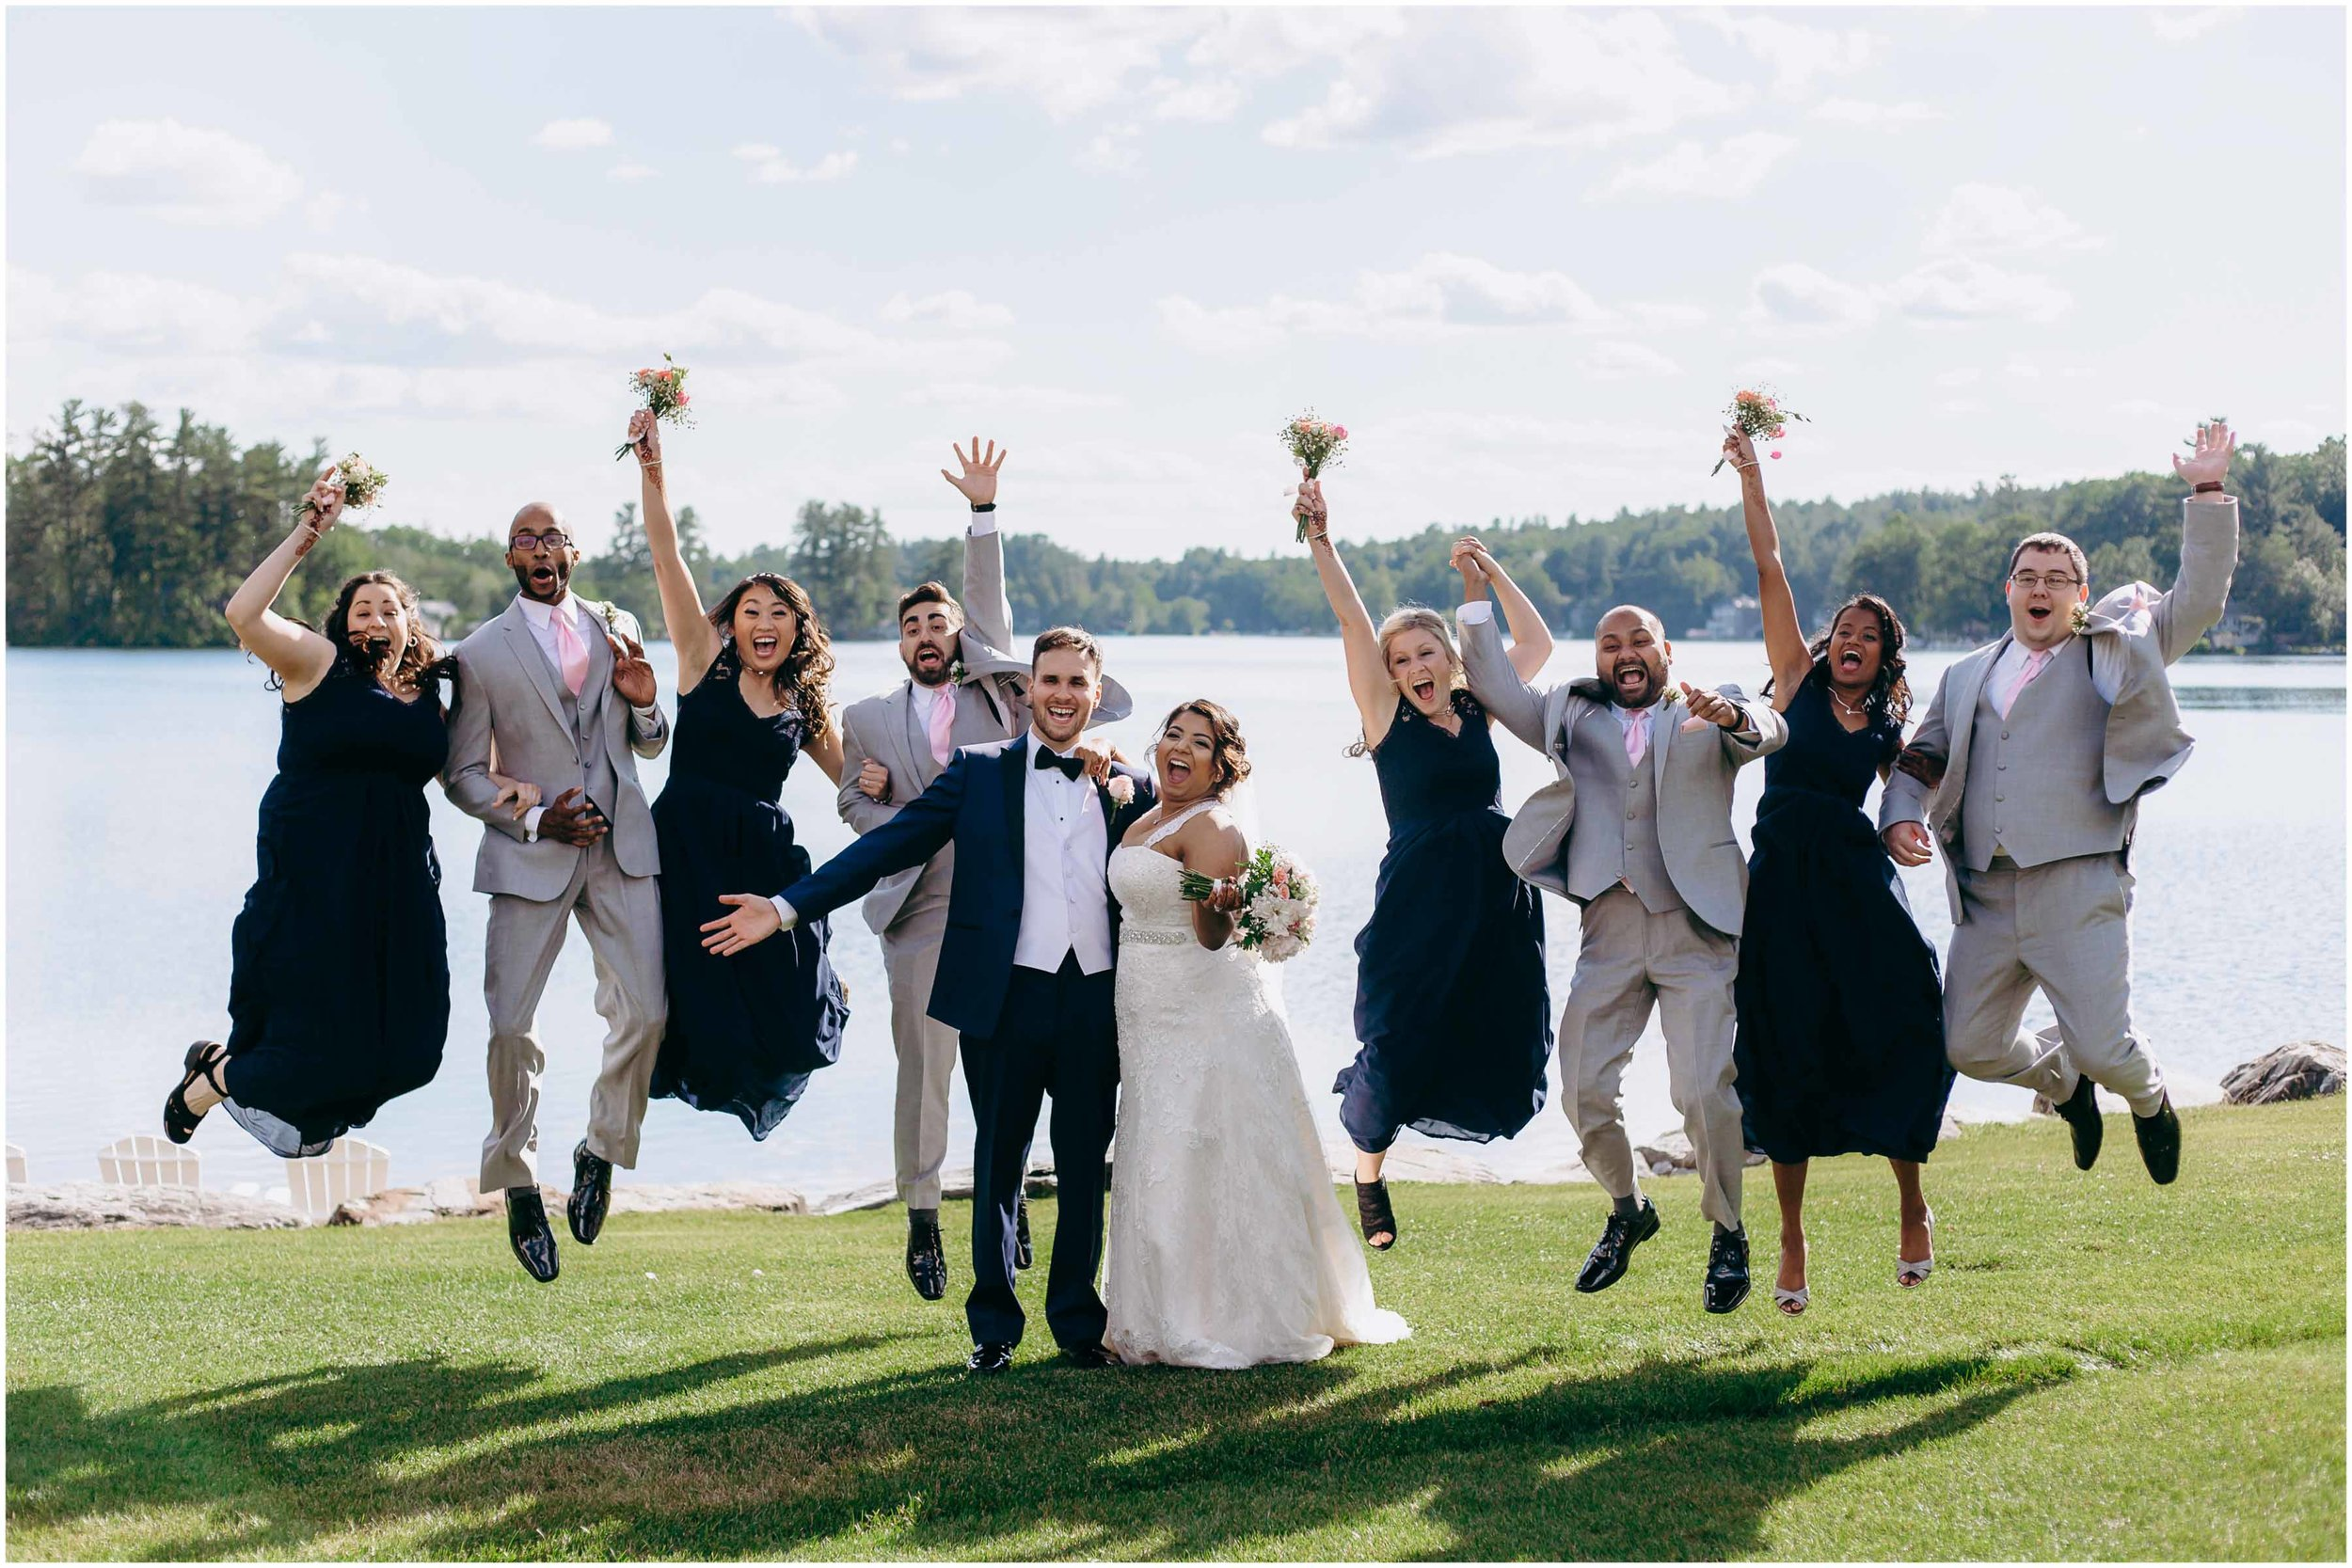 NH wedding photography, NH wedding photographer, wedding photographer NH, wedding photographers NH, wedding photography NH, jumping wedding party,